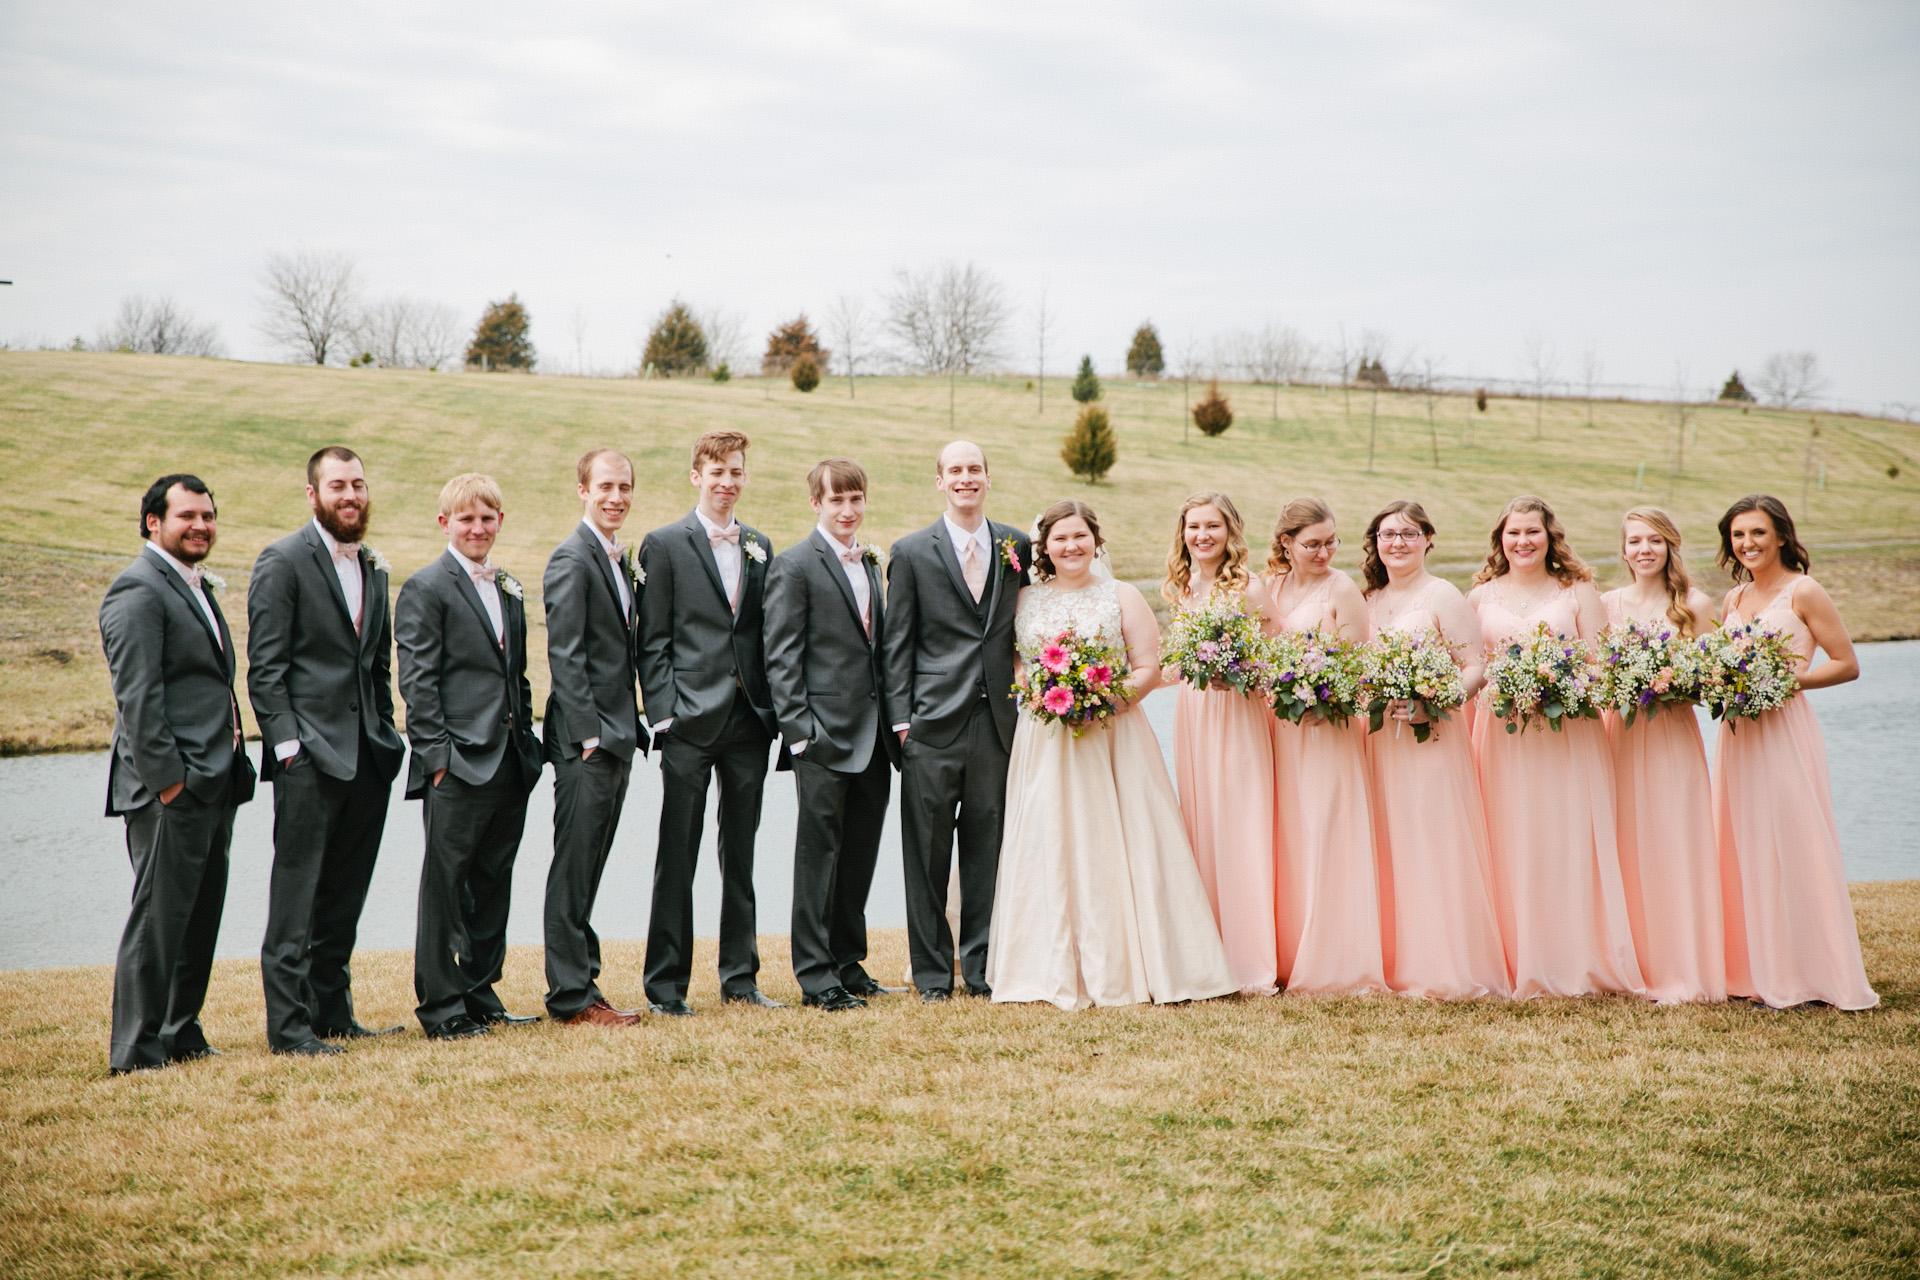 full bridal party photos